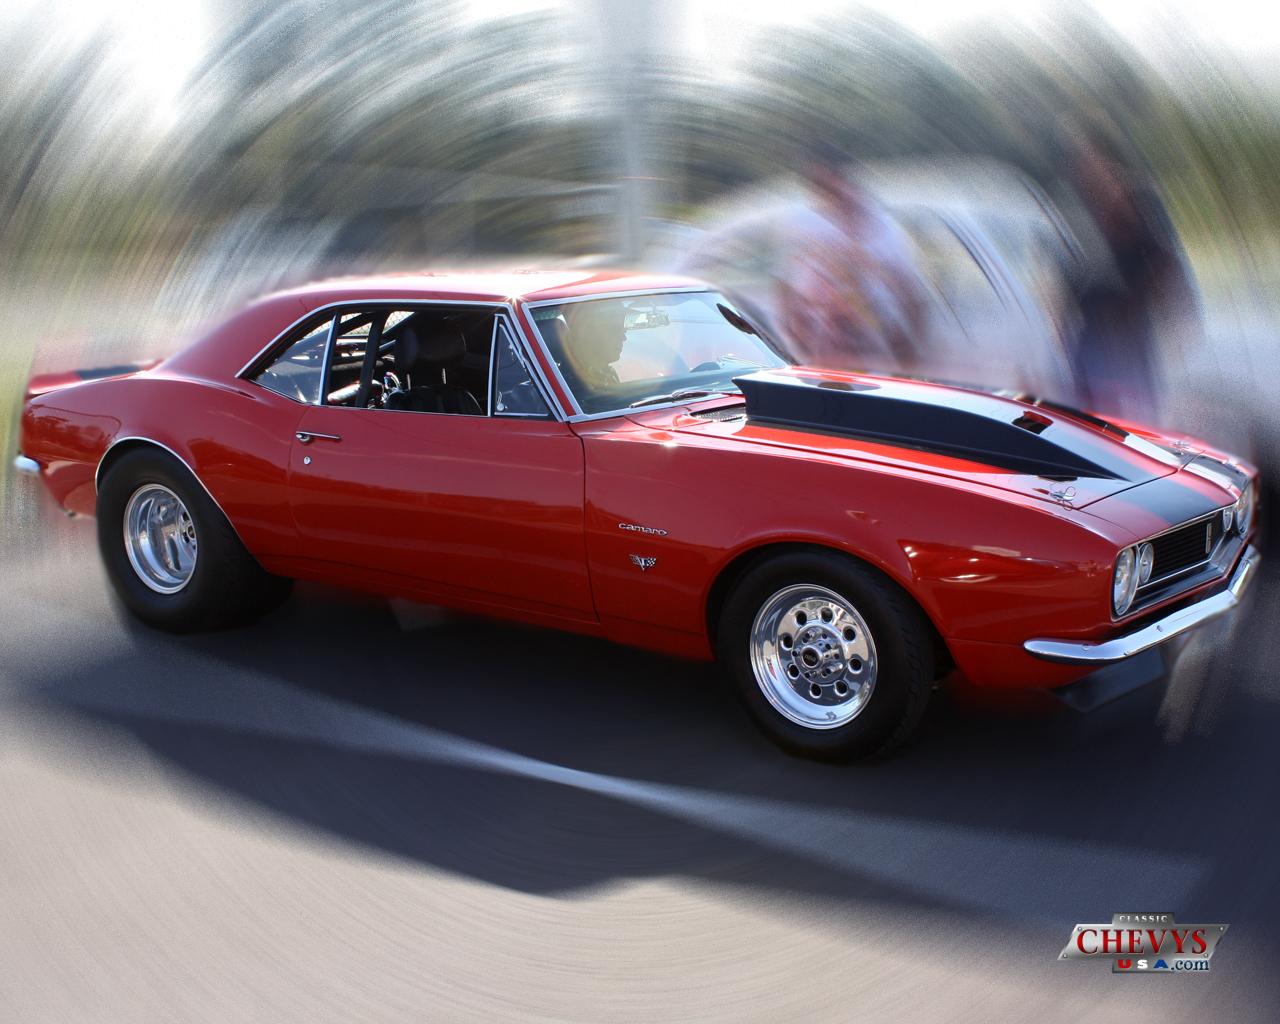 Cfree Cameros Racing Car Wallpapers Free Classic Chevys Usa Wallpapers Classicchevysusa Com